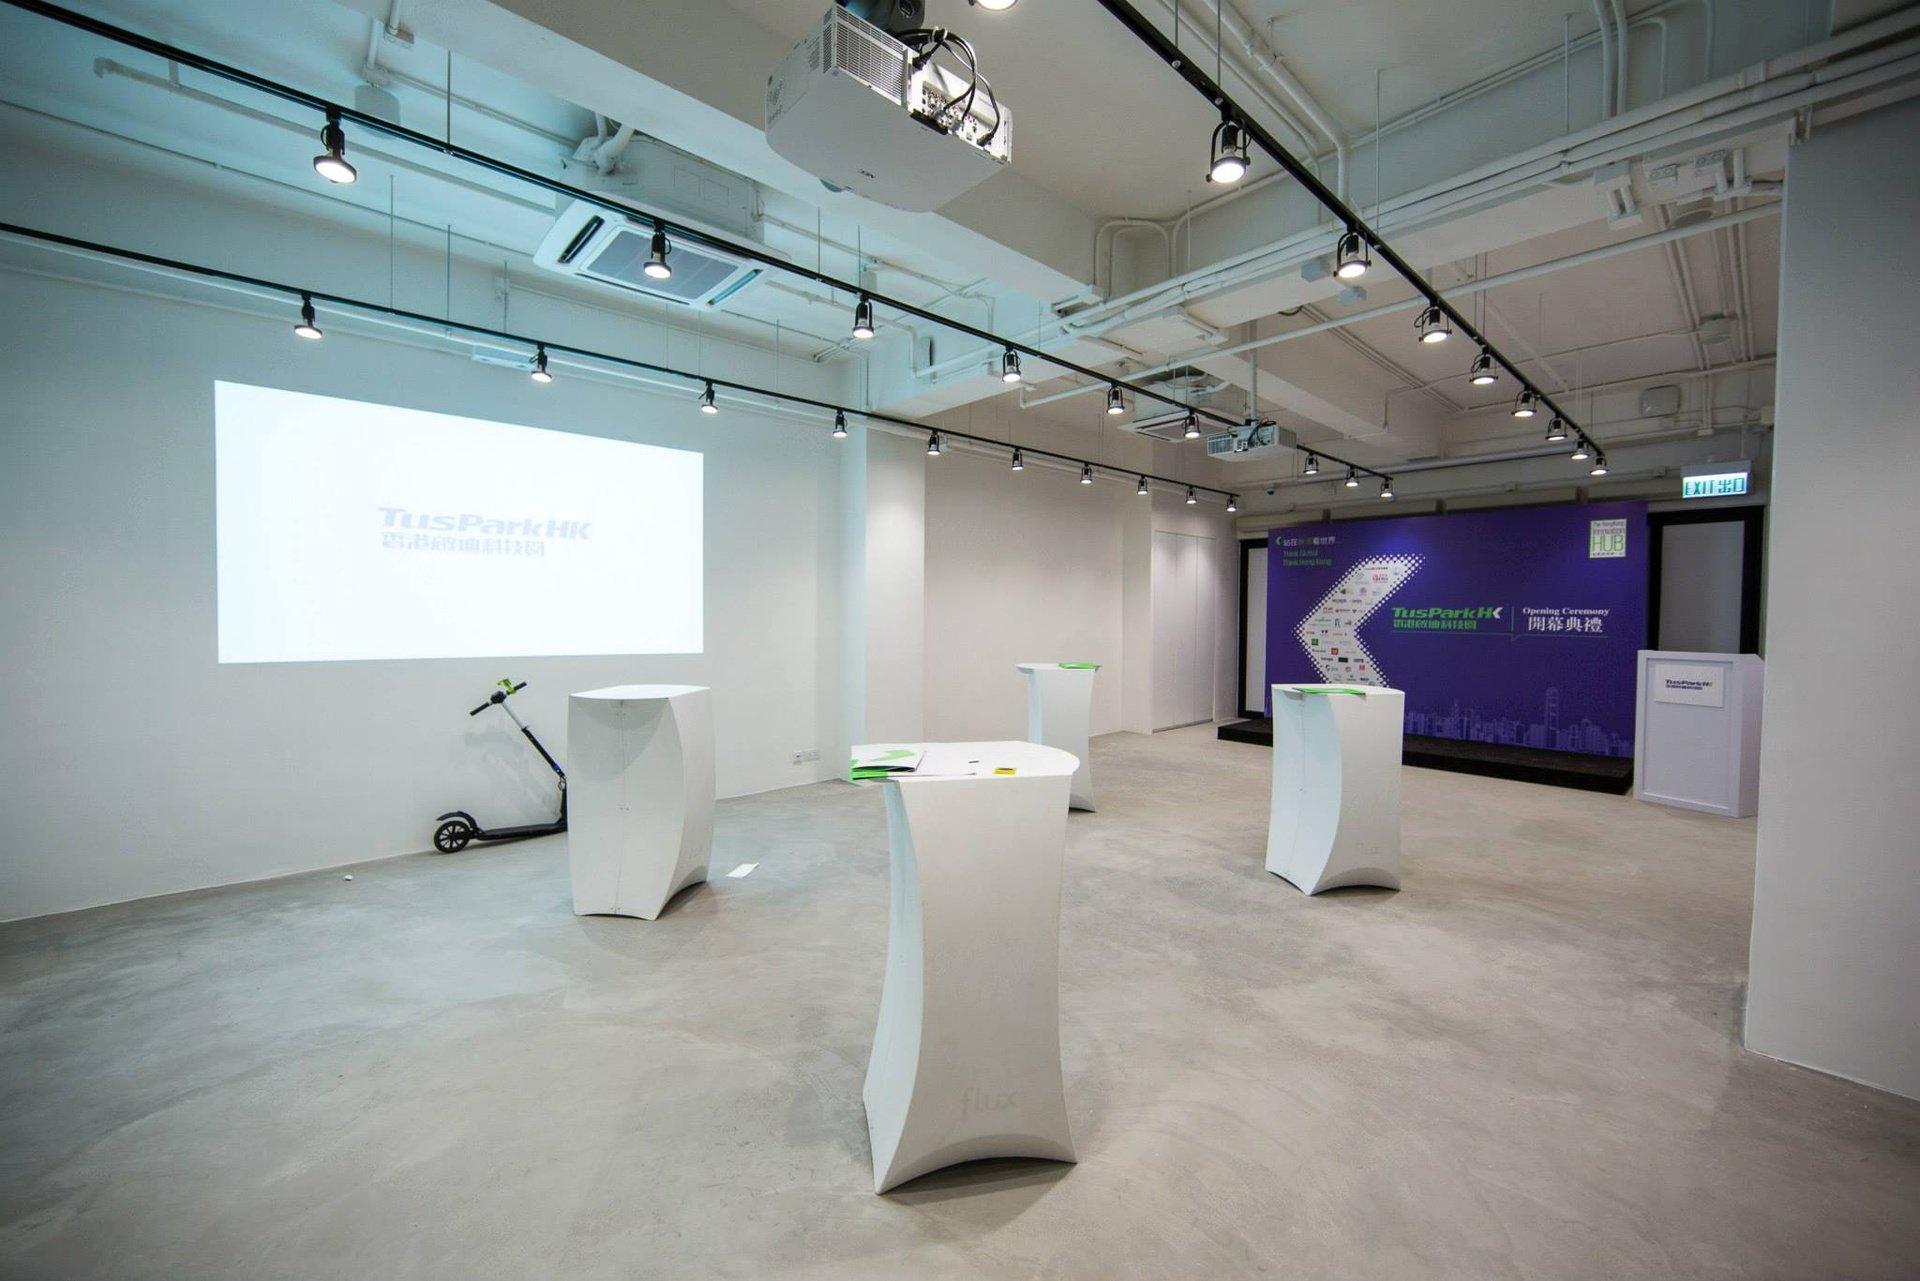 Hong Kong workshop spaces Meeting room TusPark Innovation Hub - Event Space image 0